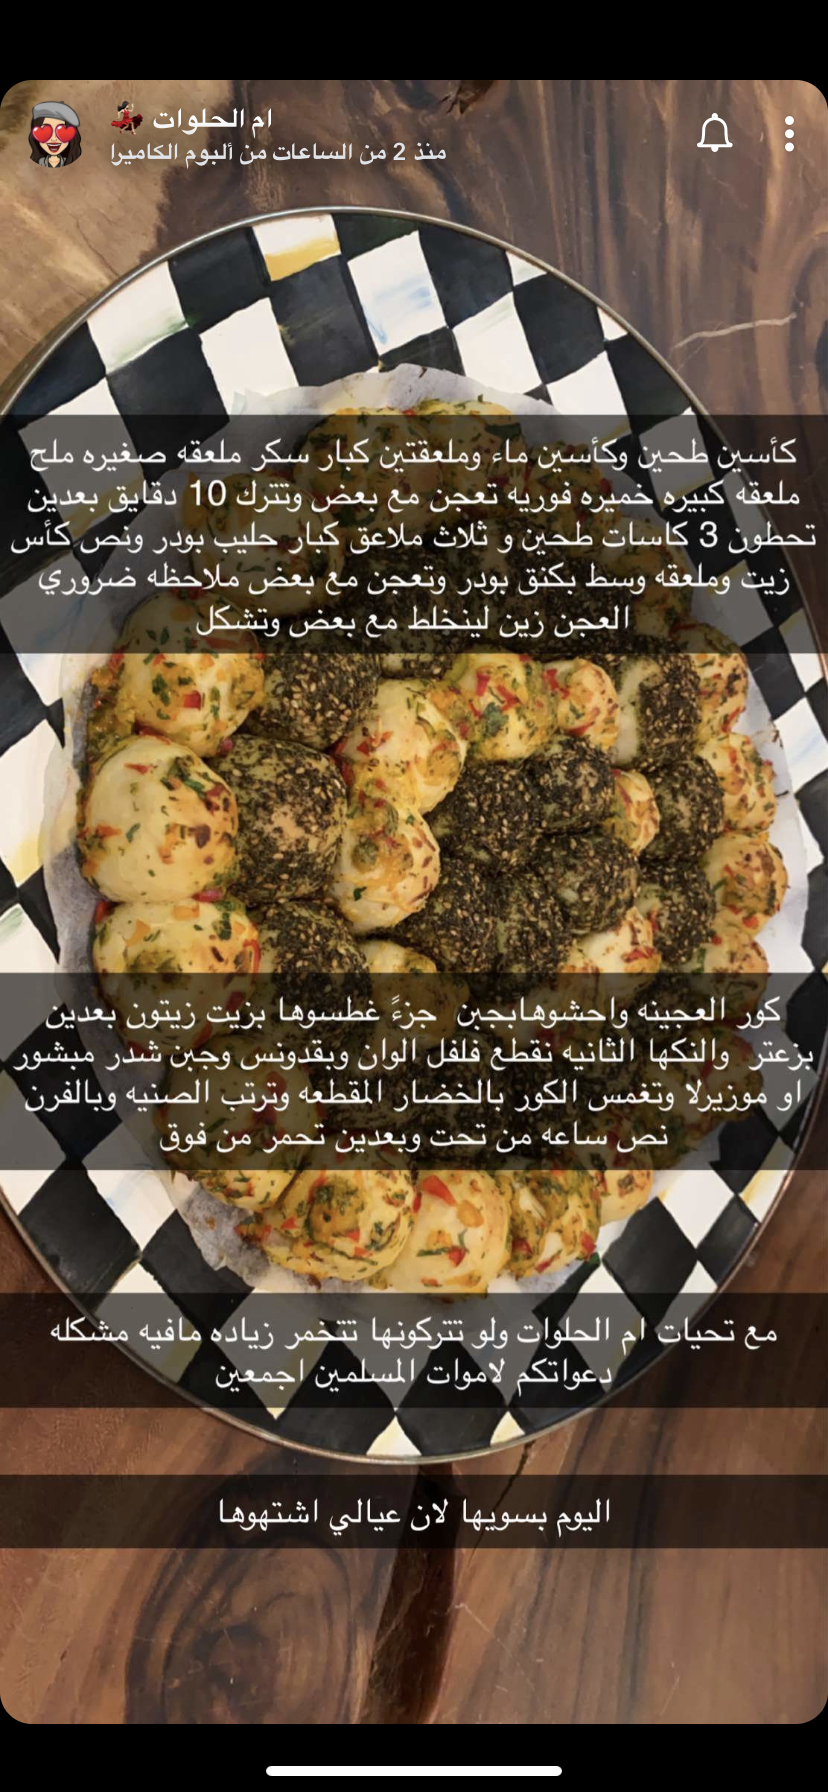 Pin By F Alahmari0 On وصفات Healthy Recipes Cooking Food